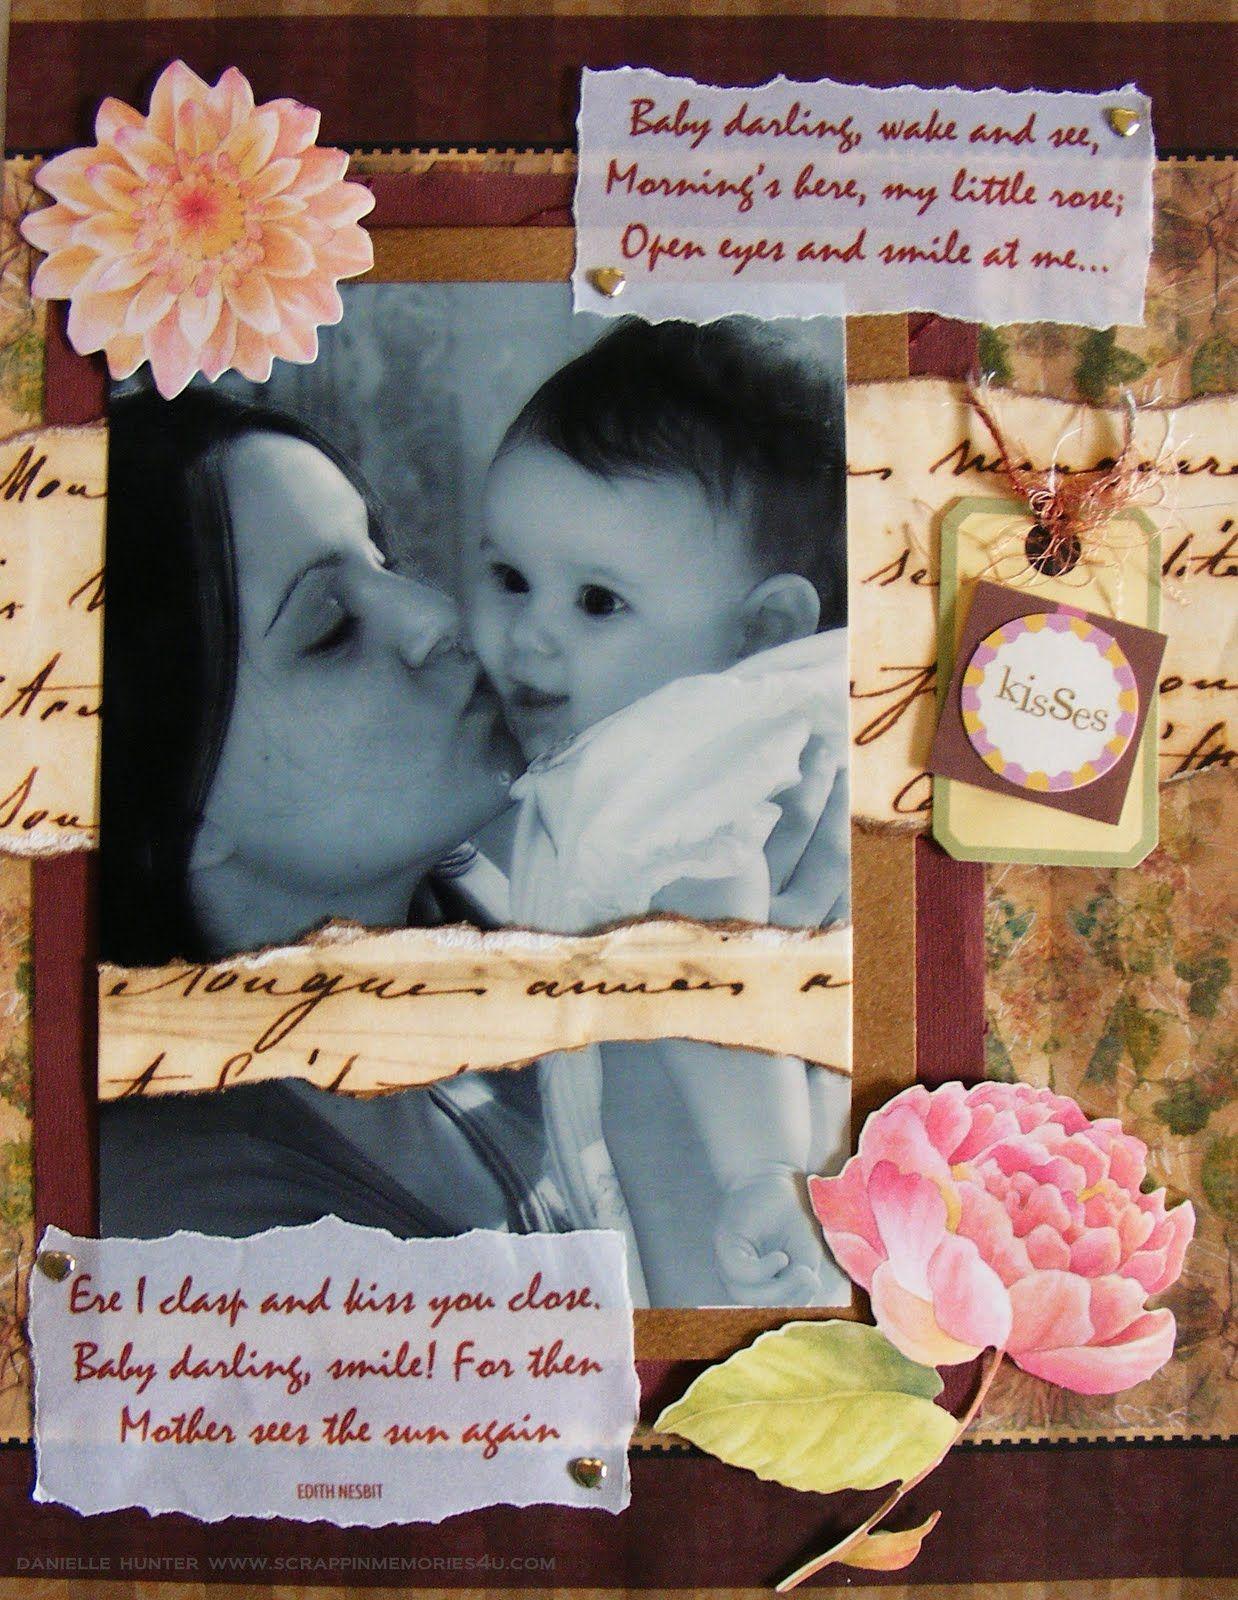 Baby scrapbook ideas on pinterest - Tweet Baby Scrapbook Layouts Journaling To Remember Your